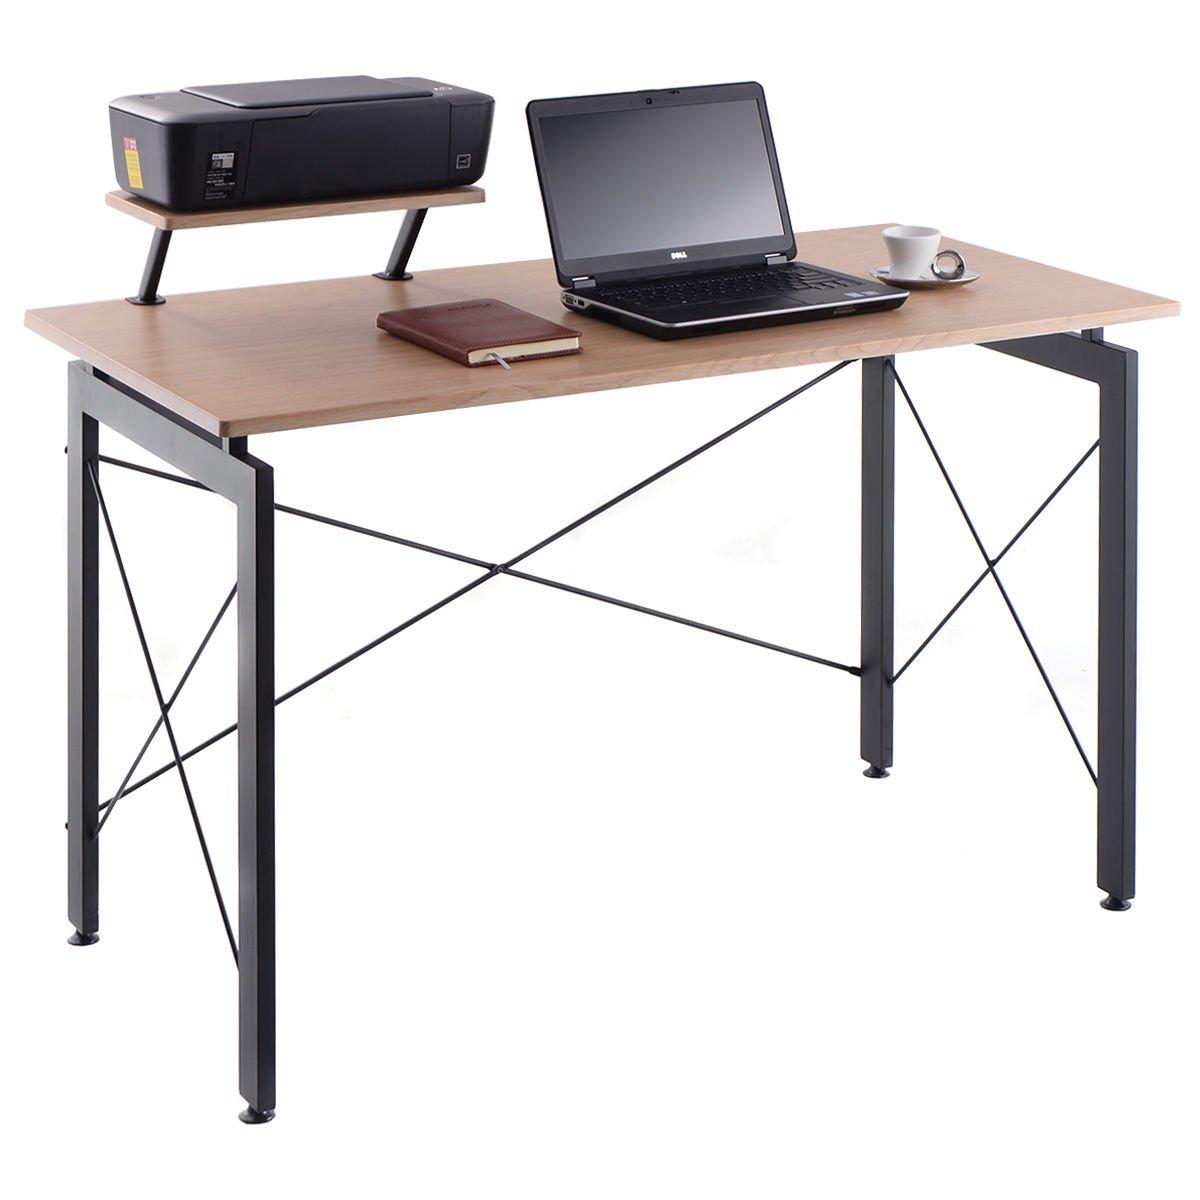 Amazon.com: Tangkula Computer Desk PC Laptop Table w/ Printer Shelf ...